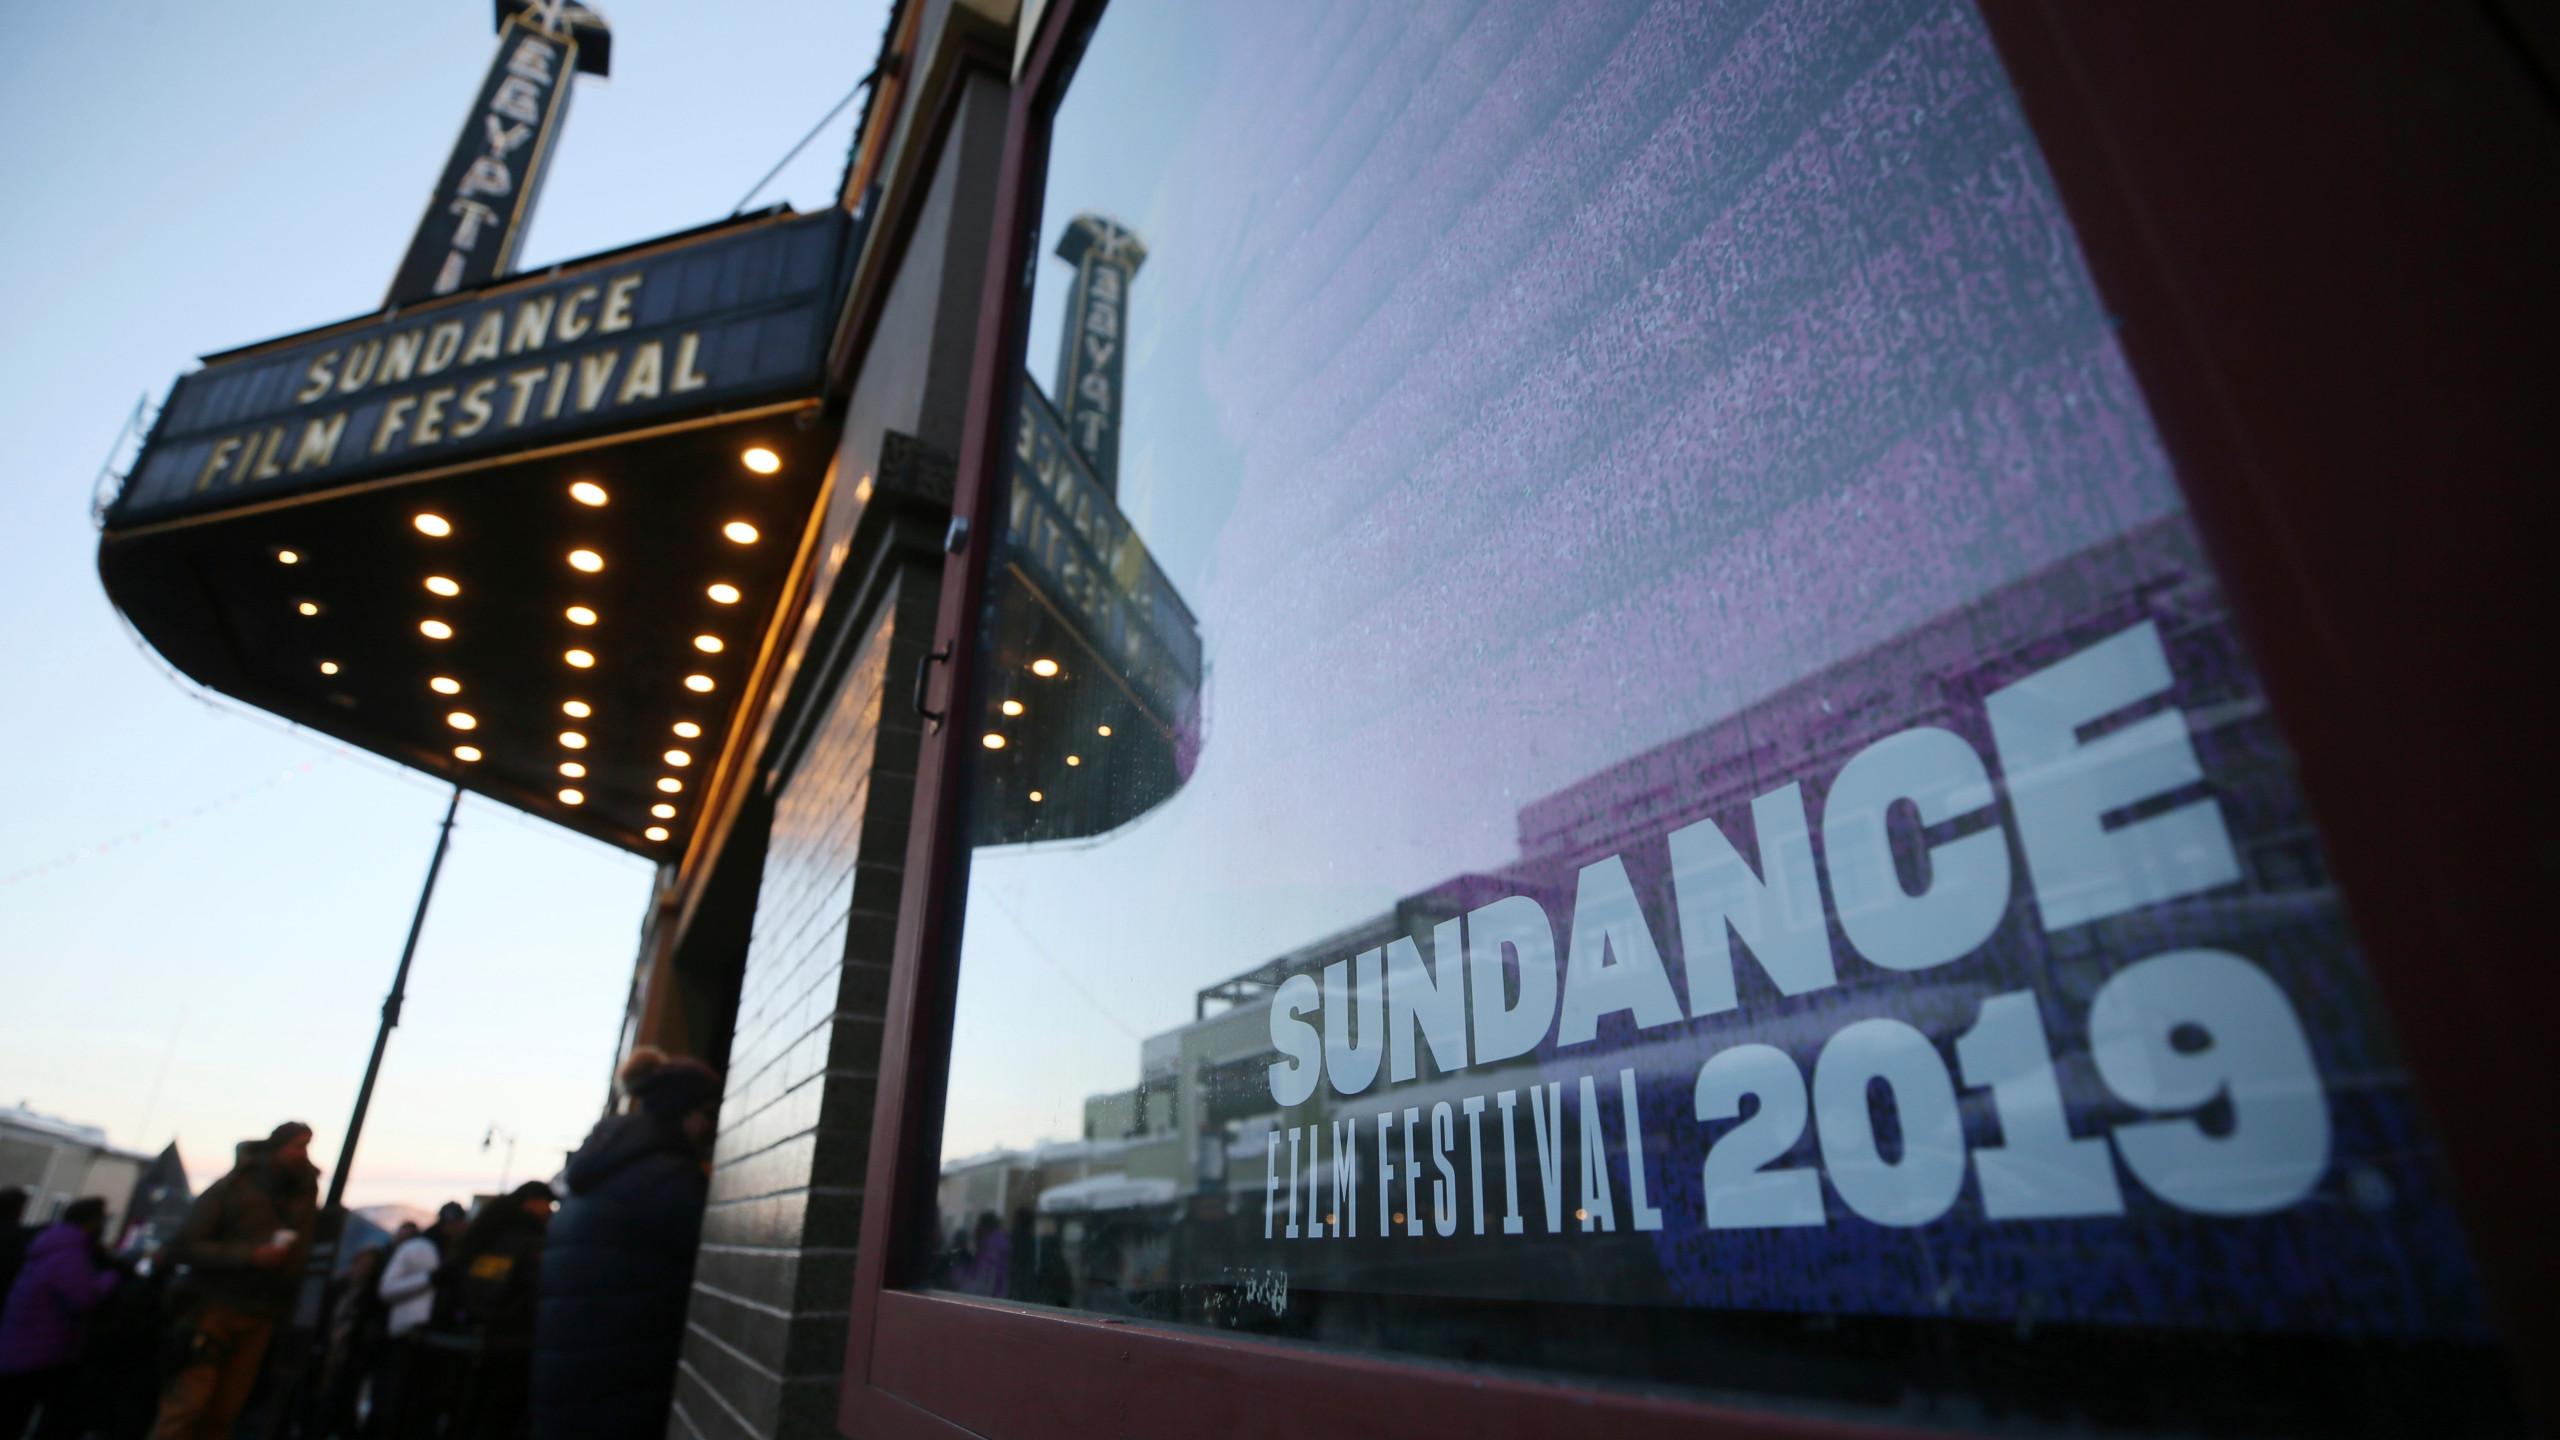 Sundance Film Festival aims for more movie critic diversity KLRT 2560x1440